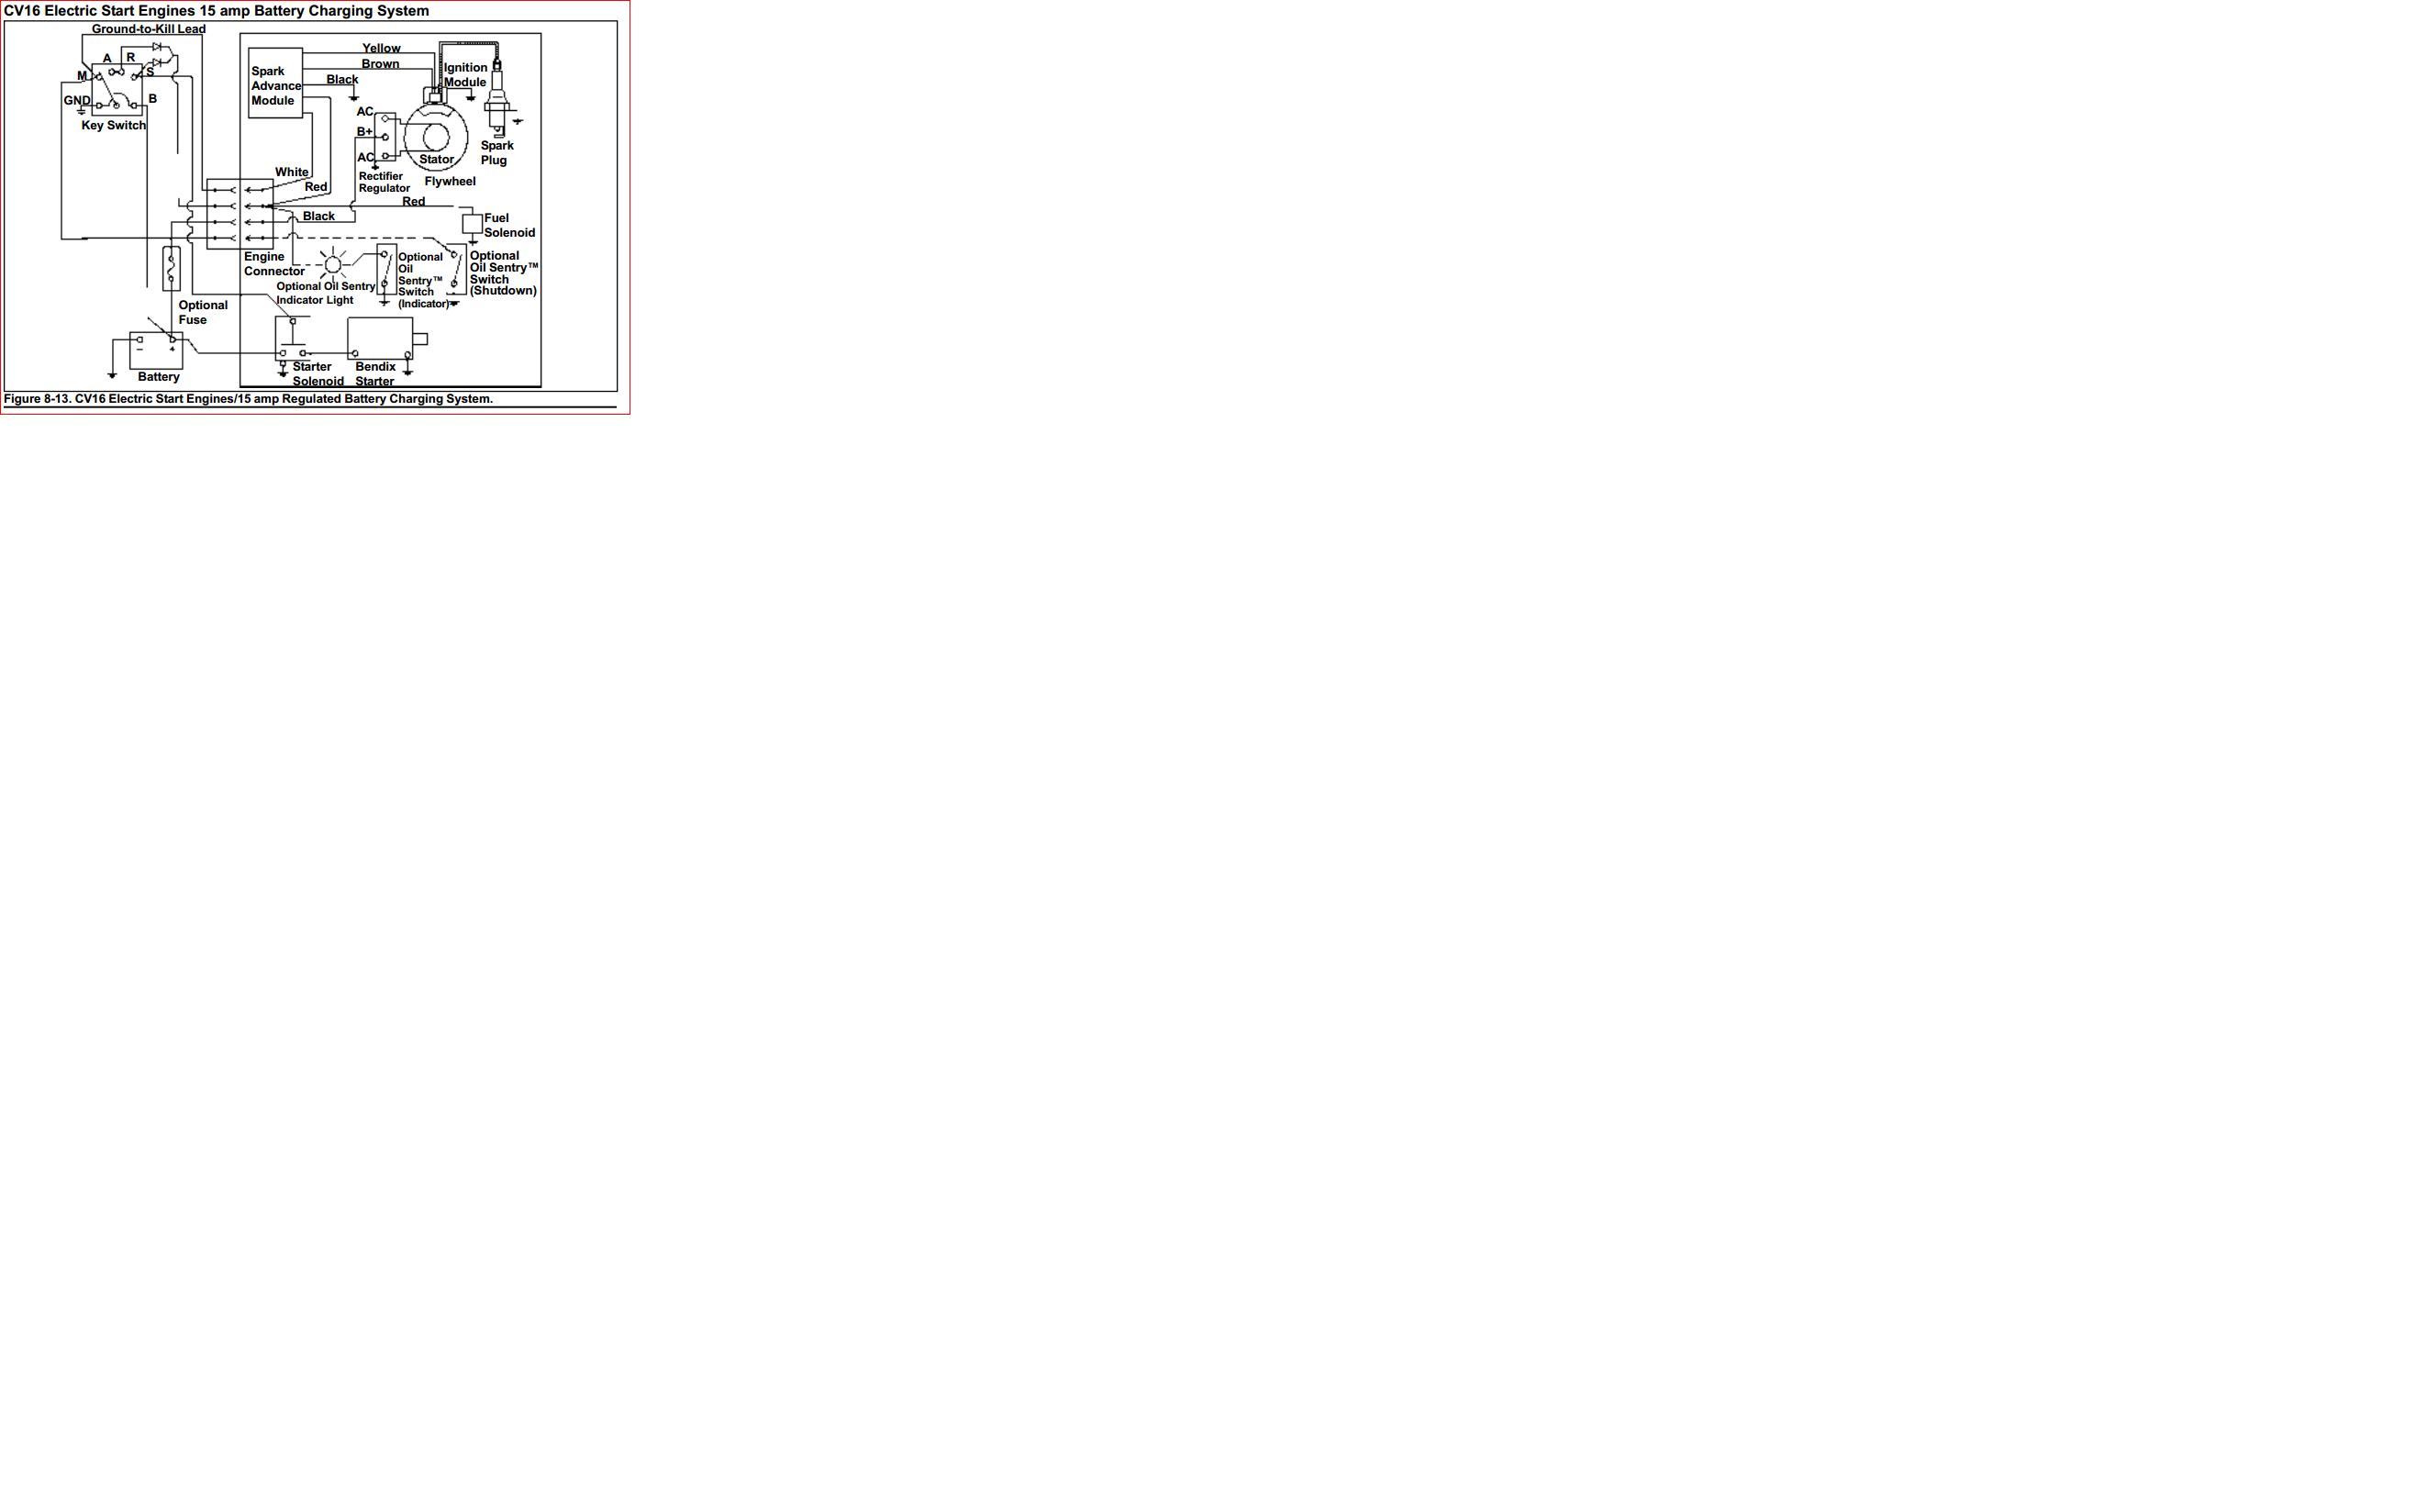 Kohler Cv16S Wiring Diagram from lh3.googleusercontent.com